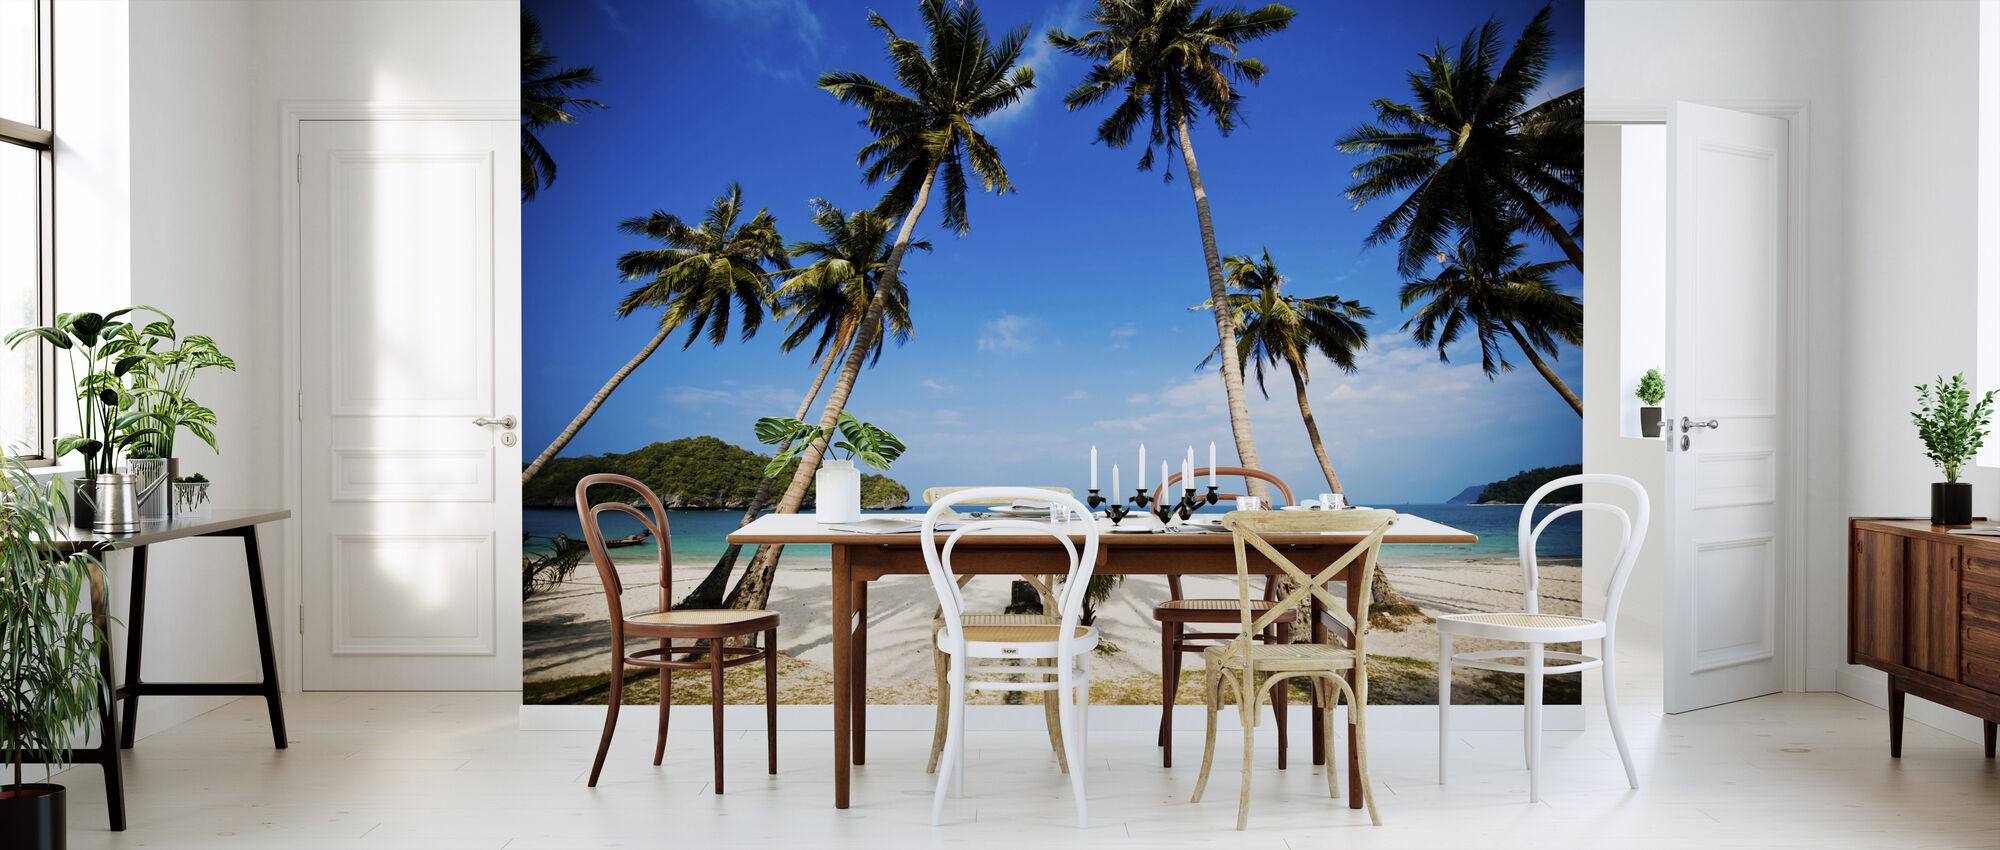 Coconut Palms, Thailand - Wallpaper - Kitchen